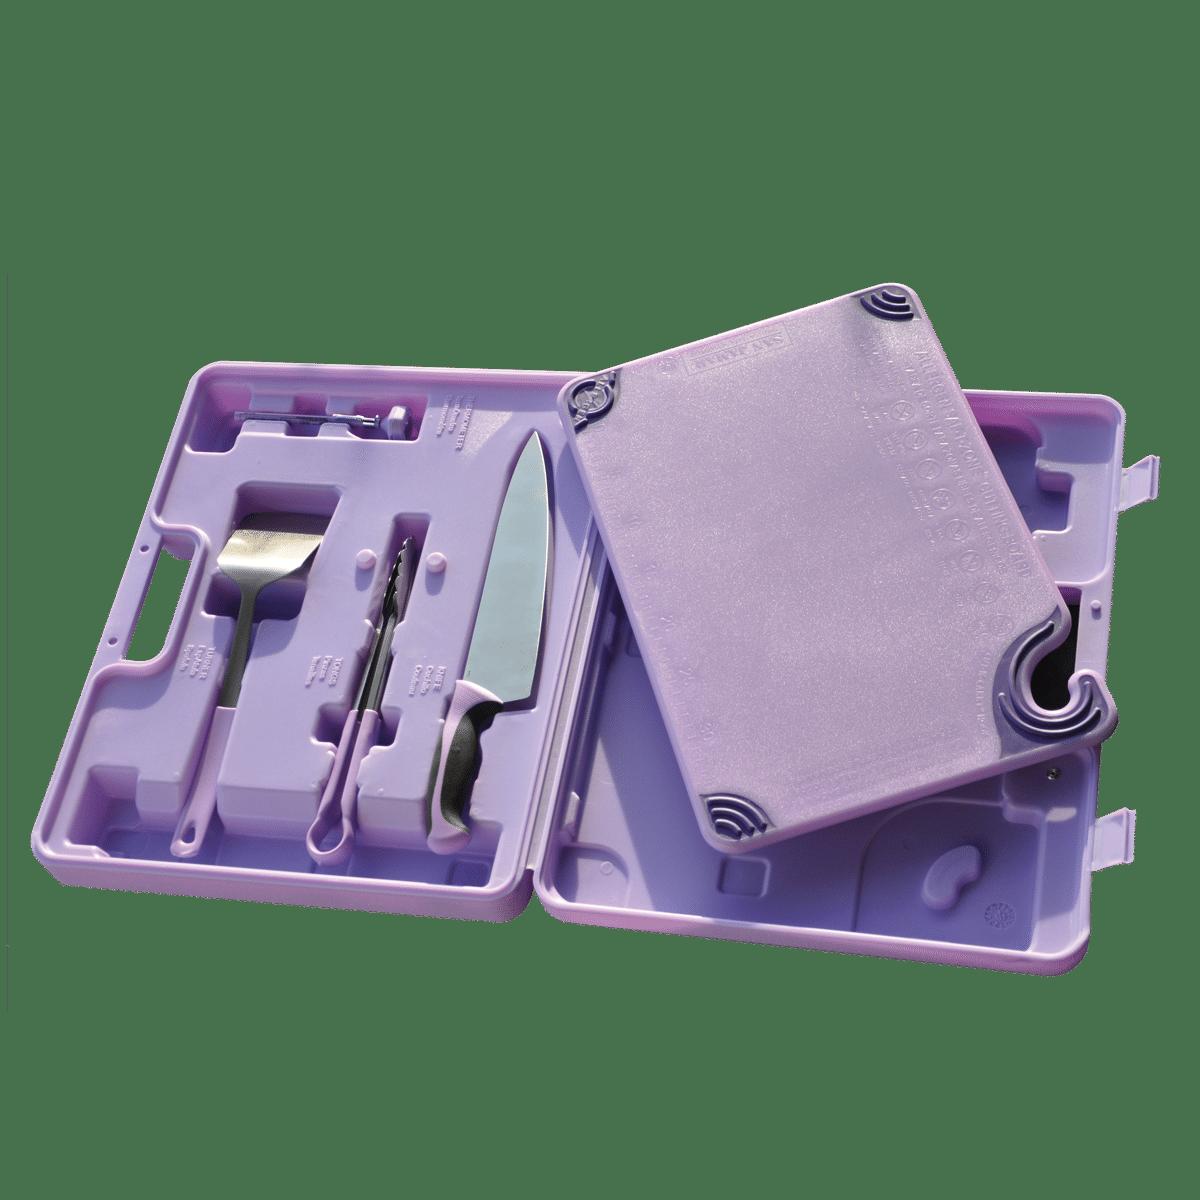 Allergen Saf-T-Zone Tools From SanJamar to ensure separation of allergen containing foods